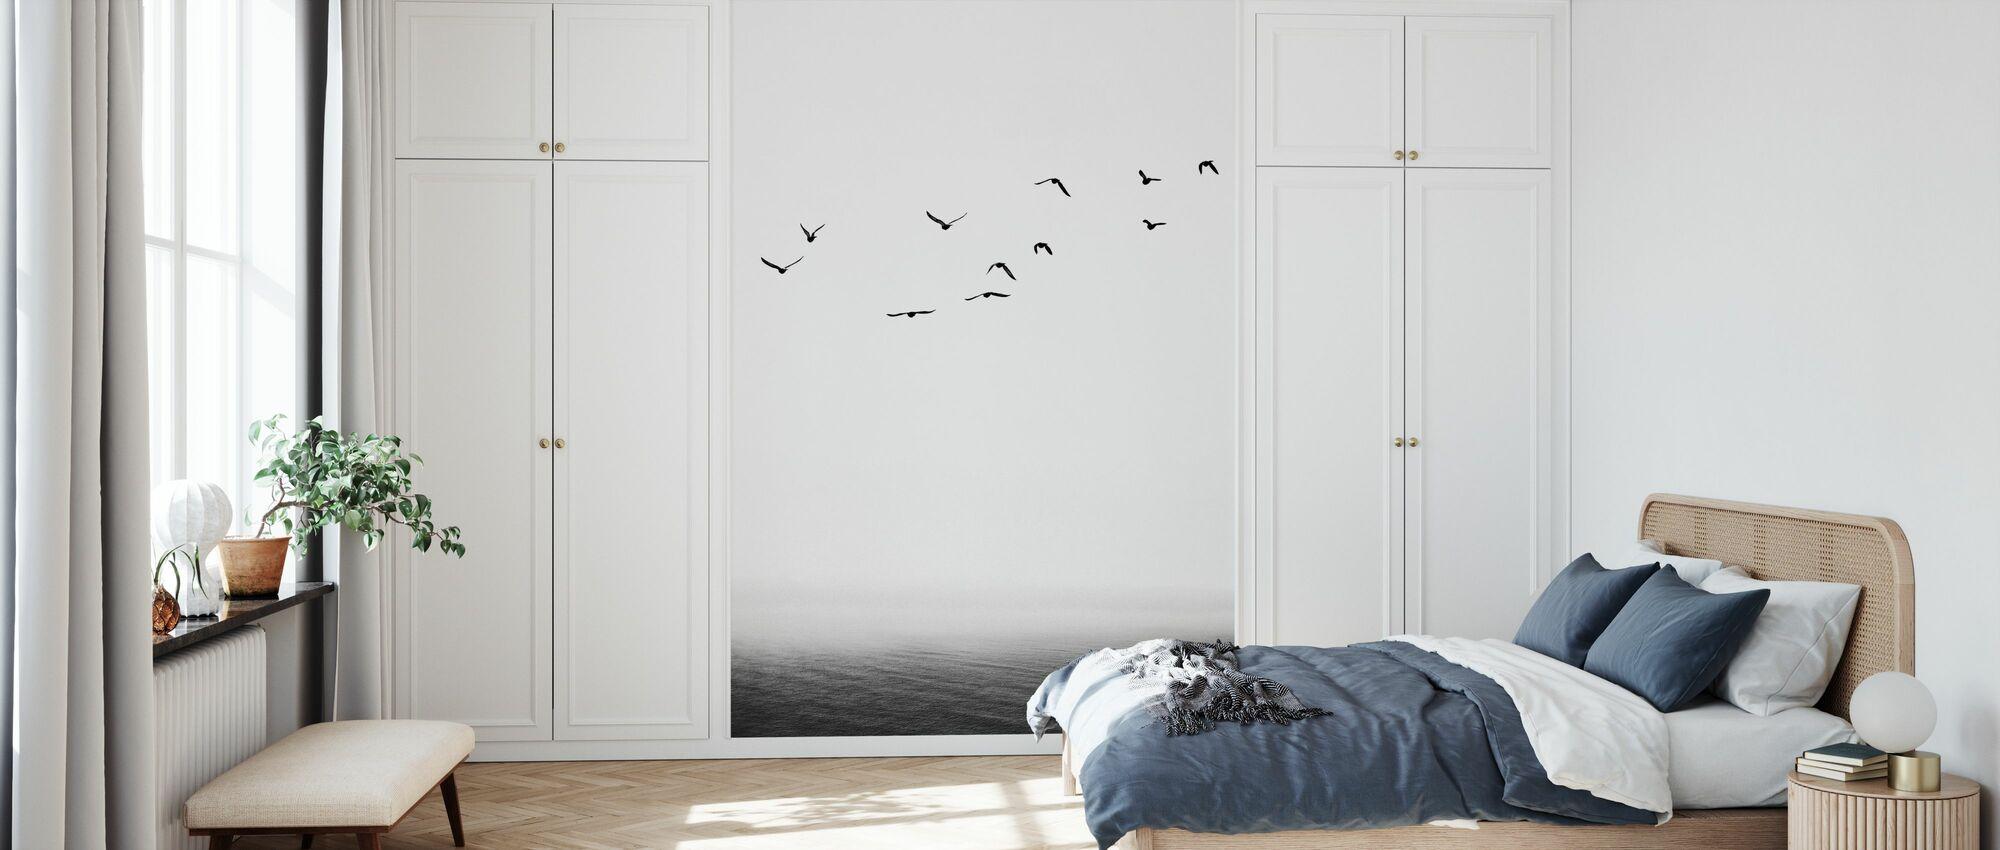 Seaside - Wallpaper - Bedroom